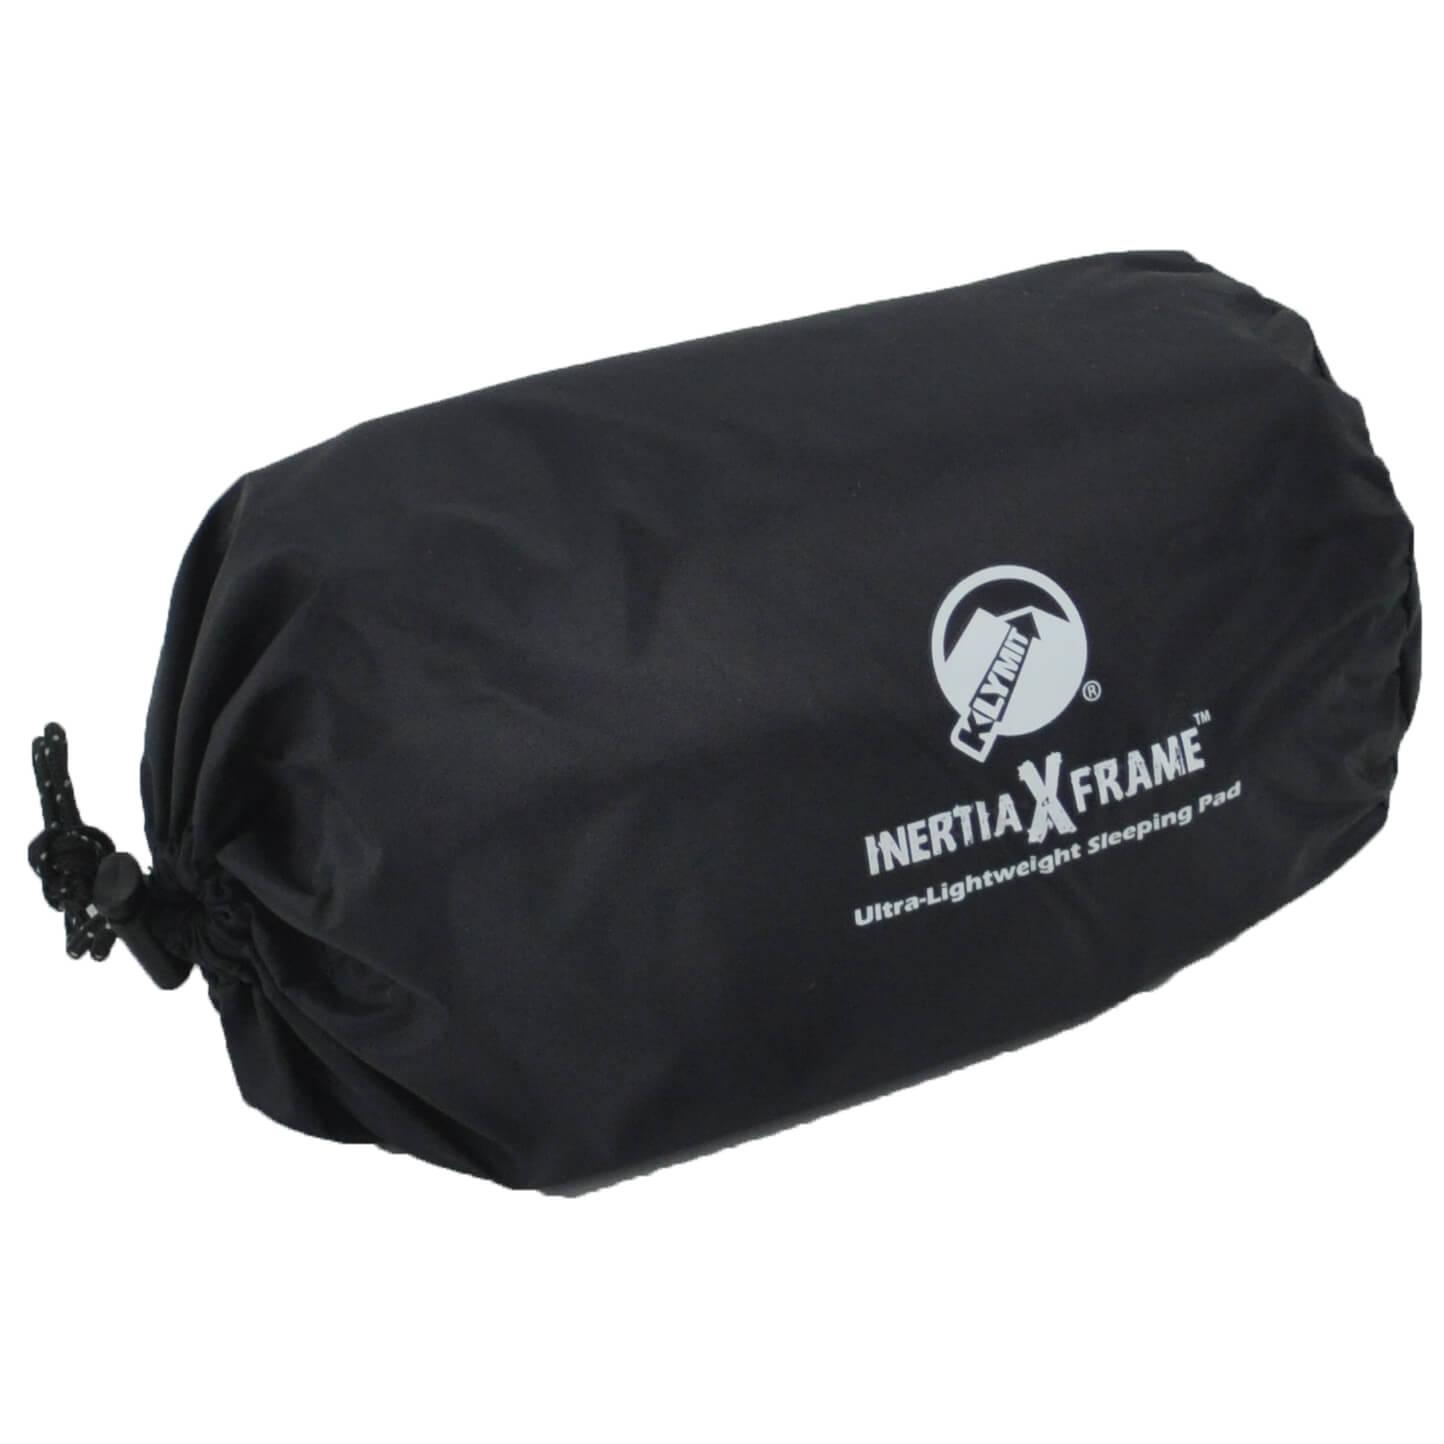 Klymit Inertia X Frame - Sleeping Pad | Buy online | Alpinetrek.co.uk